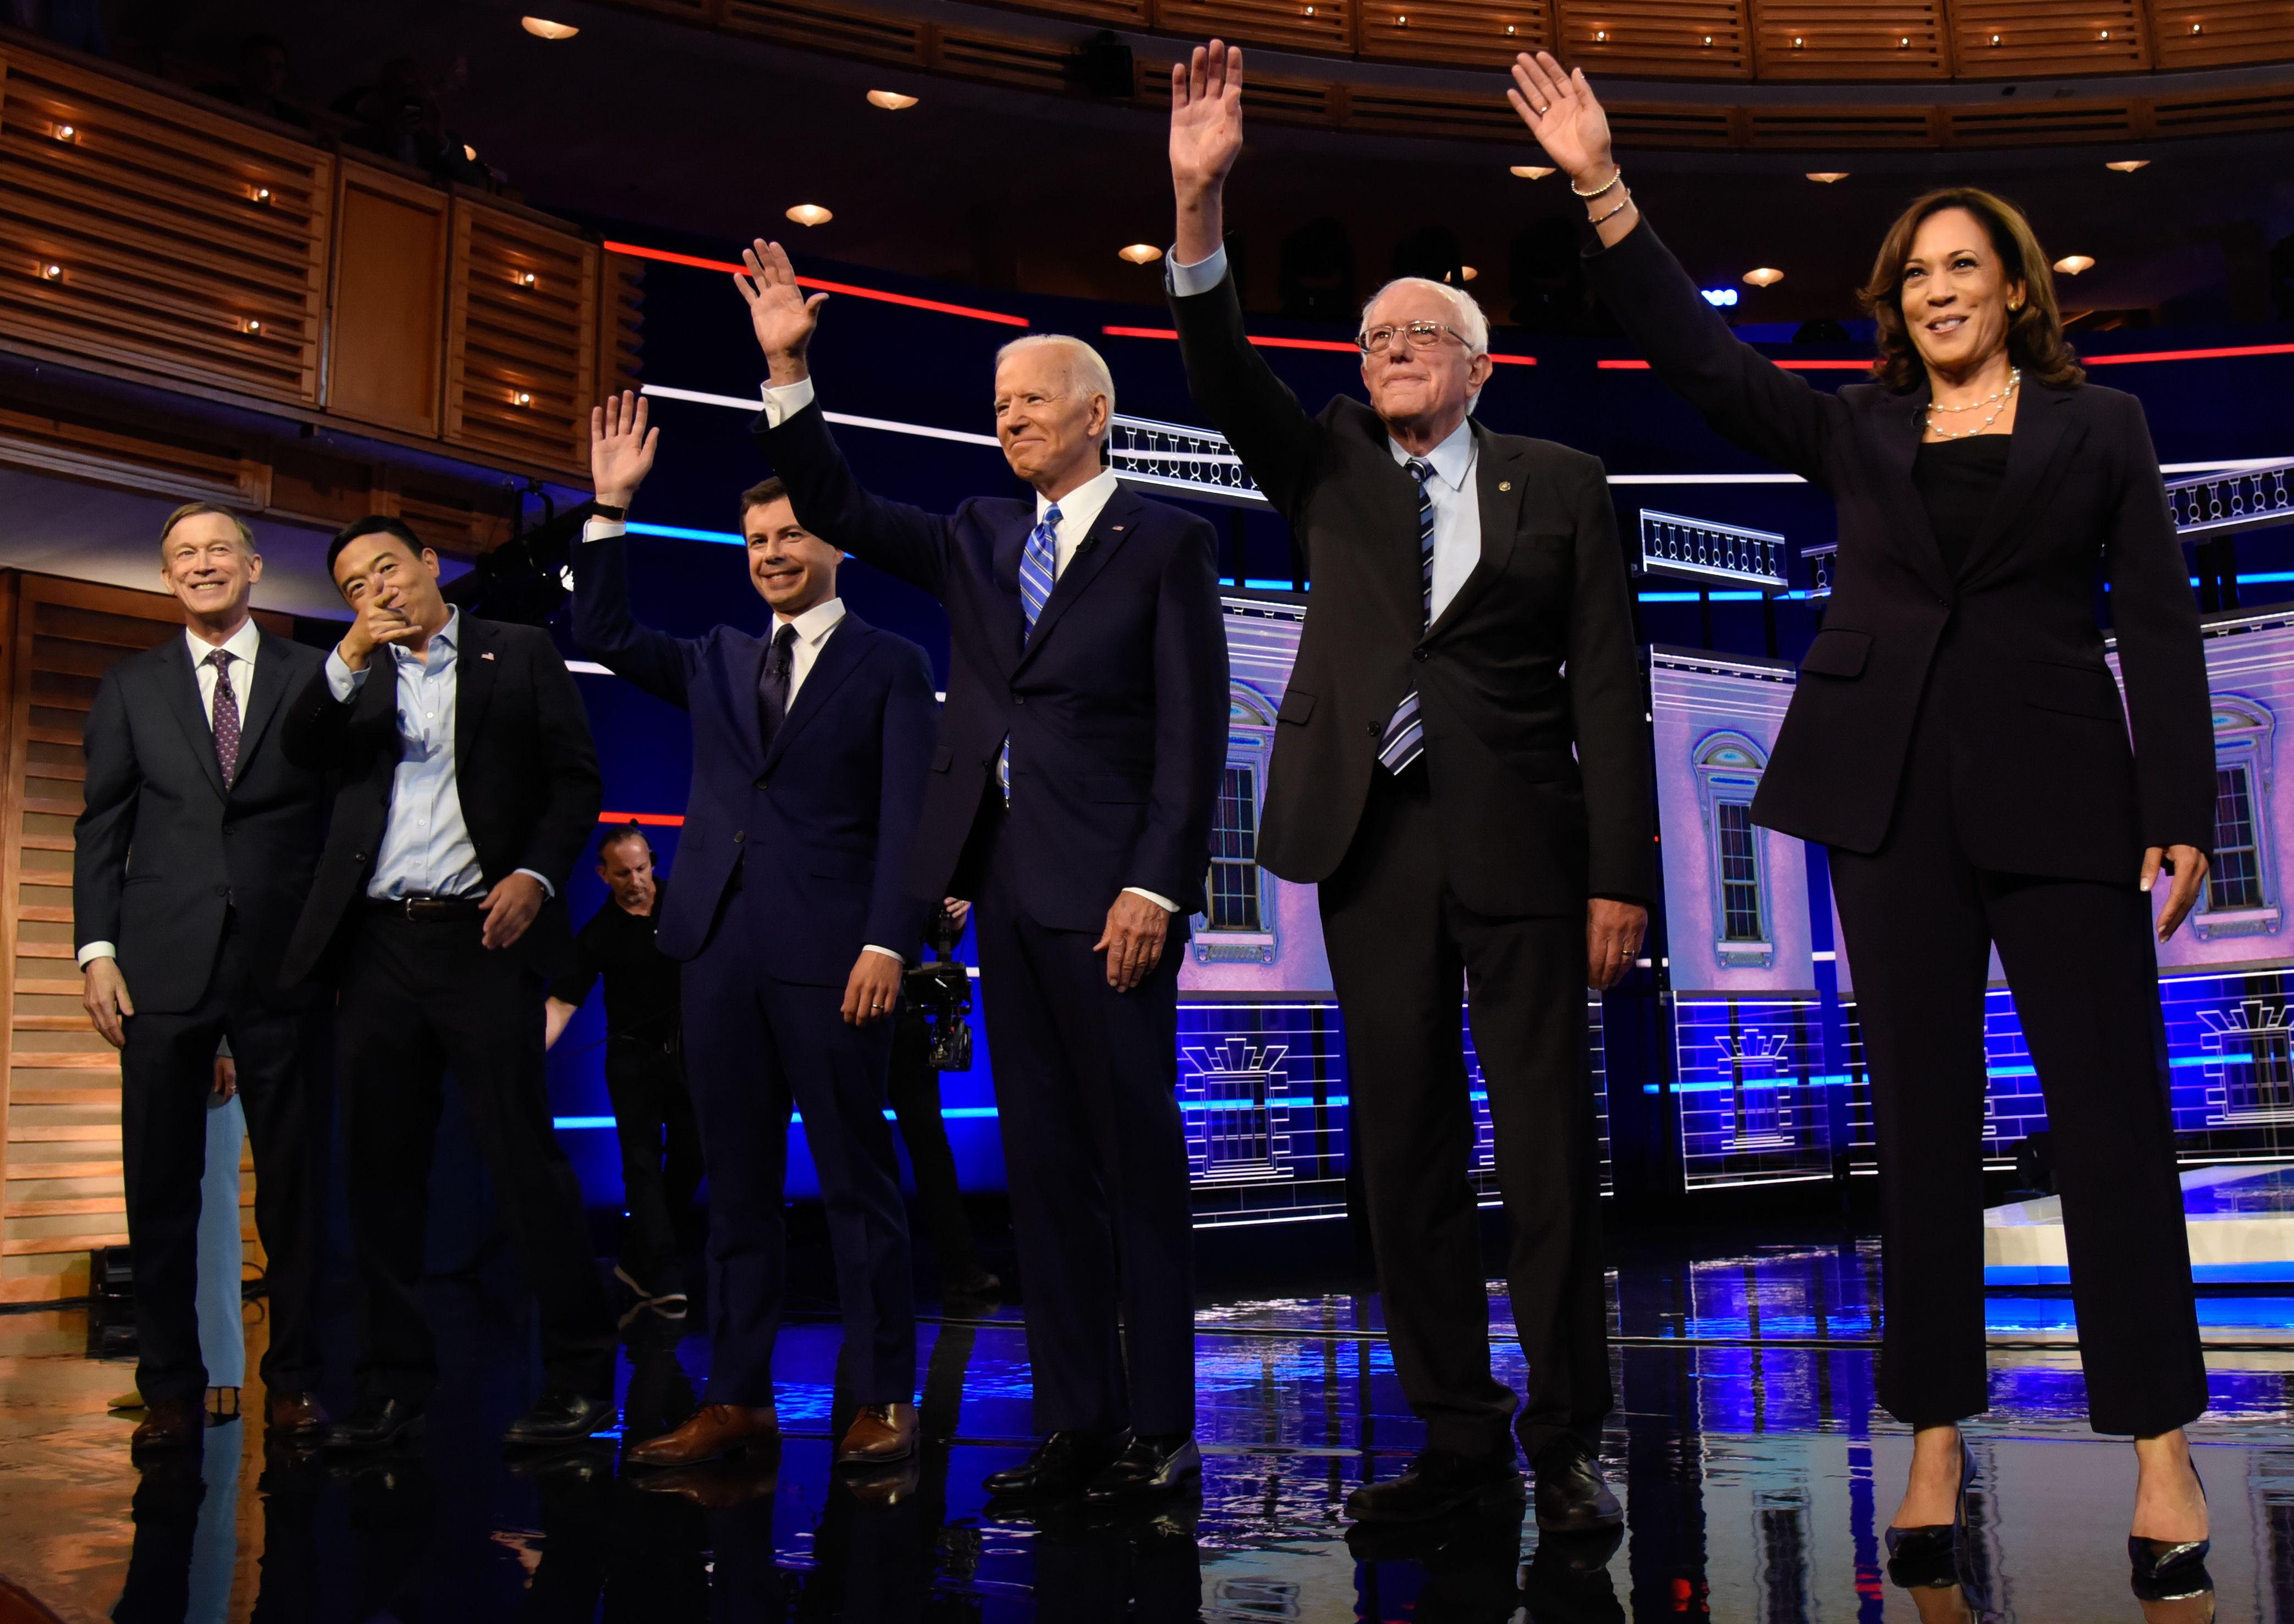 John Hickenlooper, Andrew Yang, Pete Buttigieg, Joe Biden, Bernie Sanders and Kamala HarrisFirst Democratic Presidential Debate, Miami, USA - 27 Jun 2019